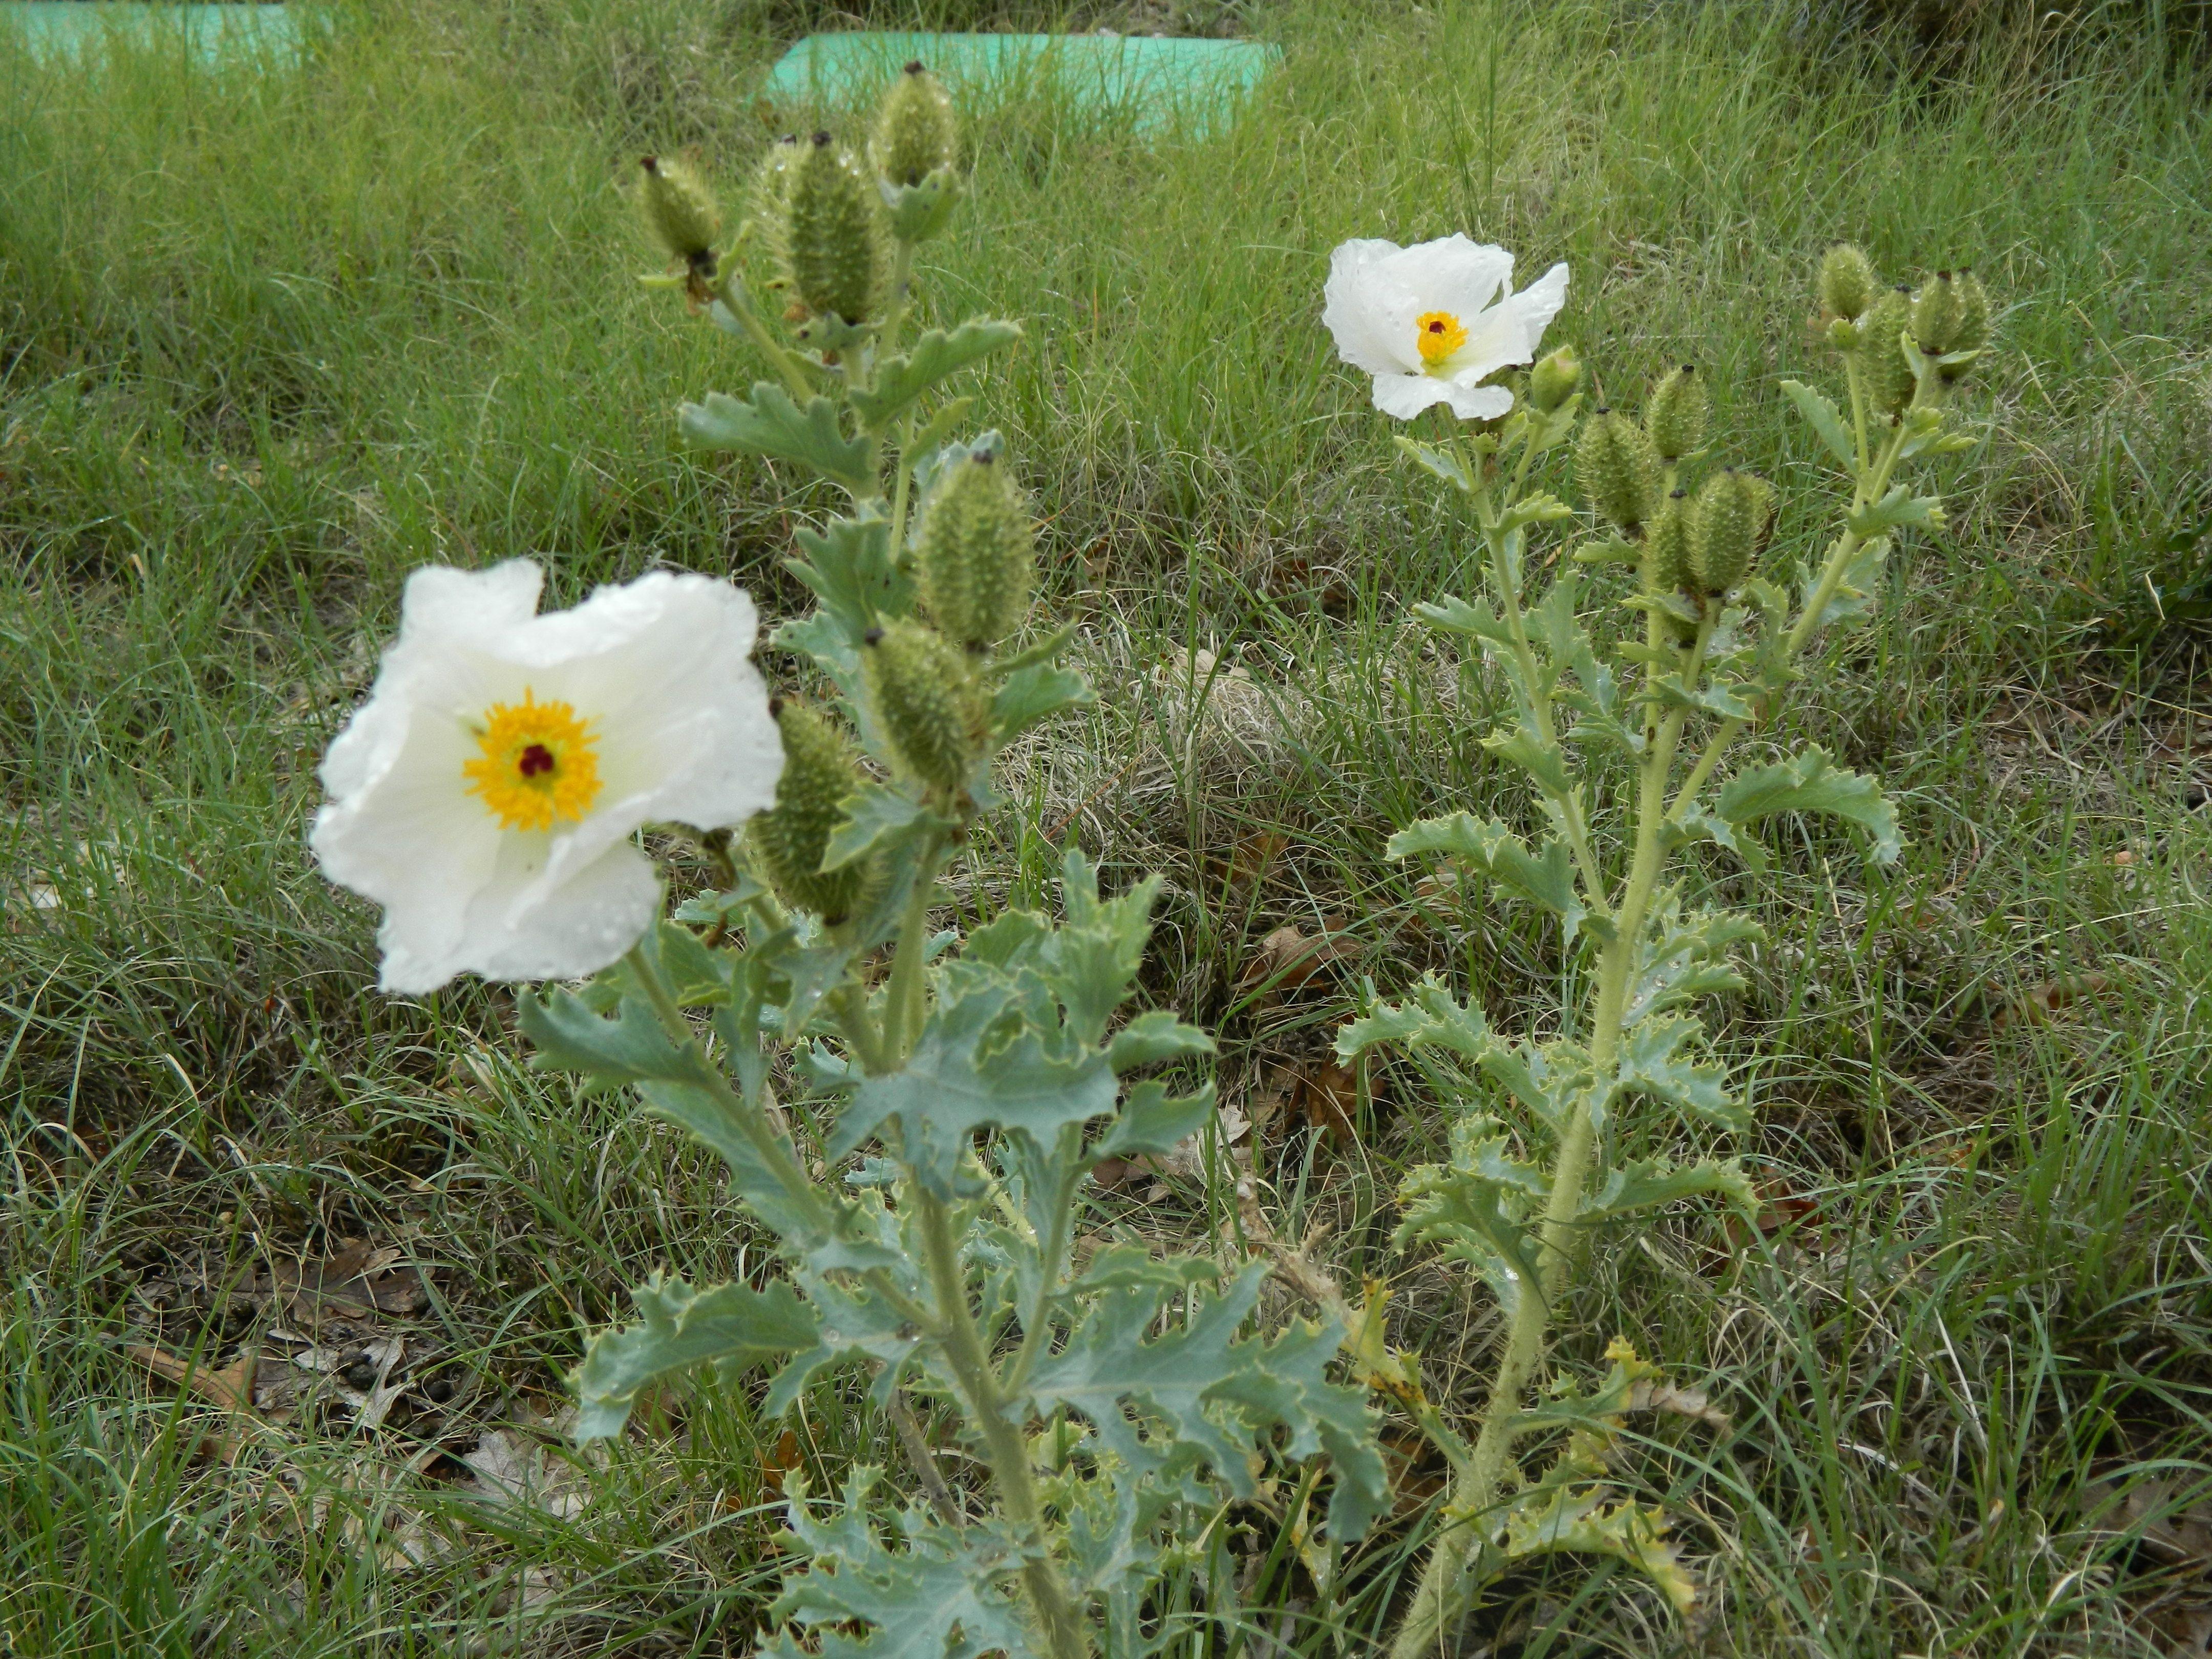 Prairie white thistle like flowers in colorado prickly poppy has prairie white thistle like flowers in colorado prickly poppy has three outstanding attributes first mightylinksfo